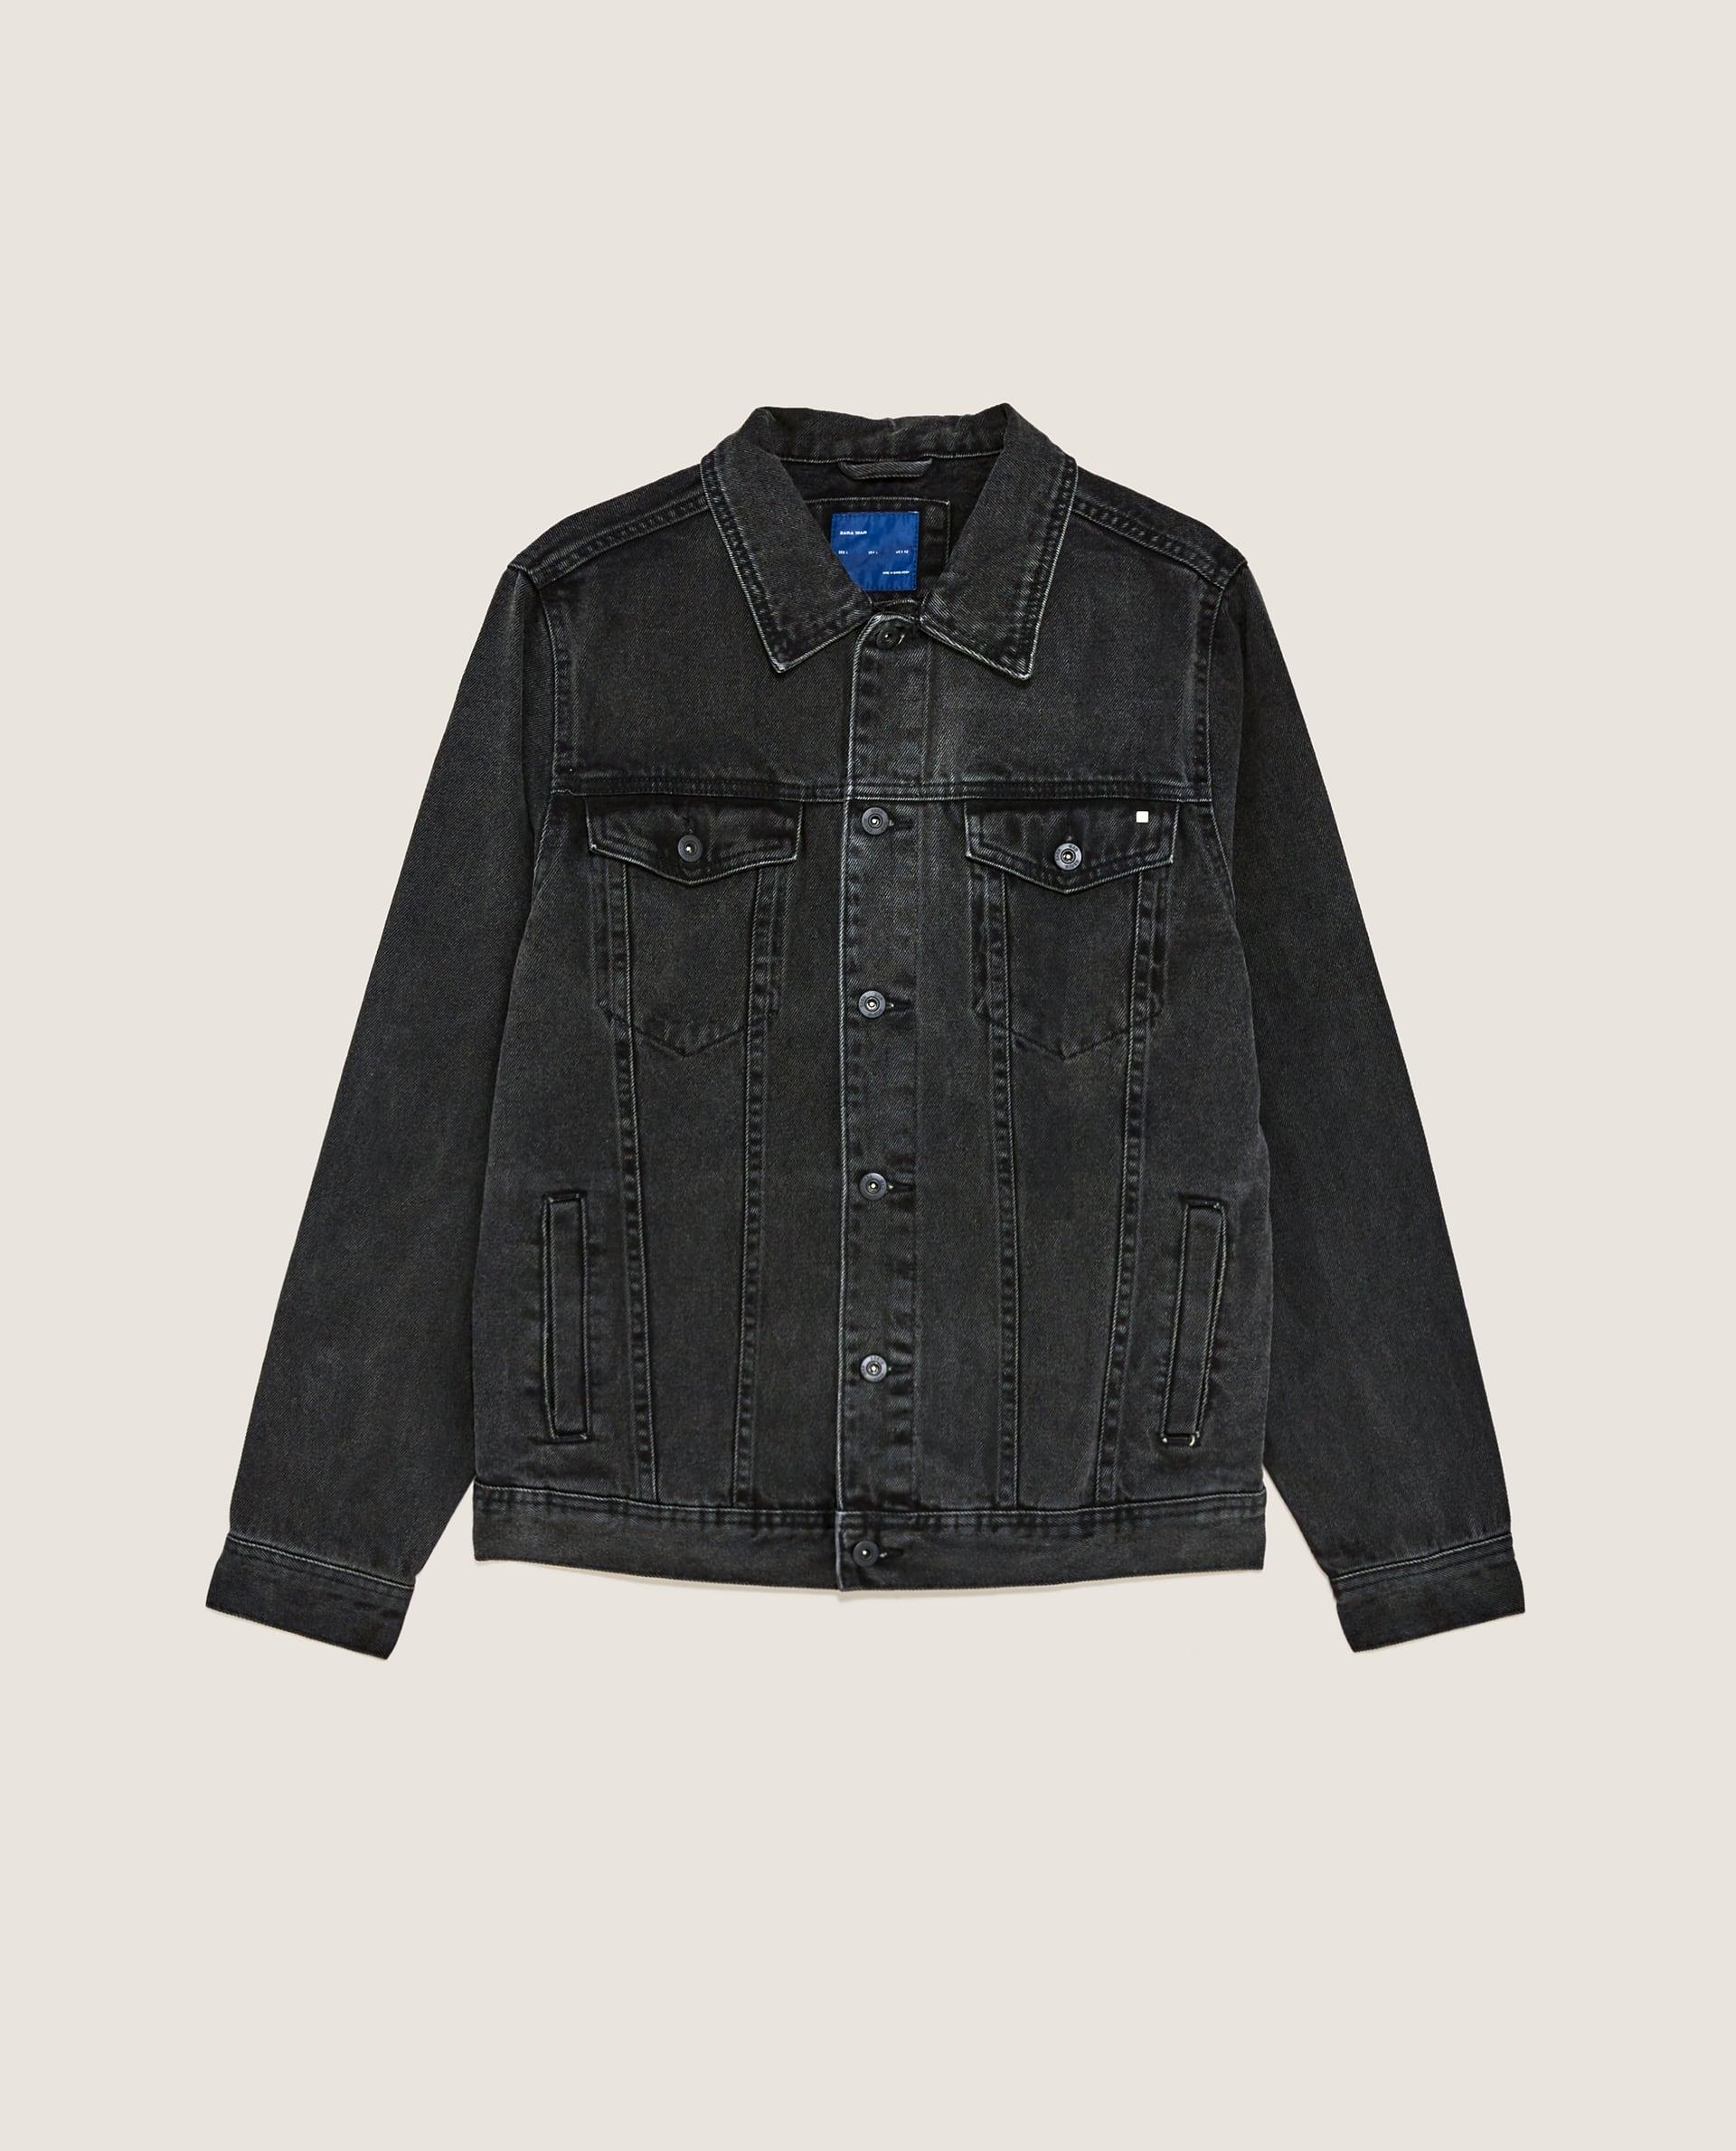 https://www.zara.com/ca/en/basic-denim-jacket-p04454450.html?v1=5320778&v2=374002